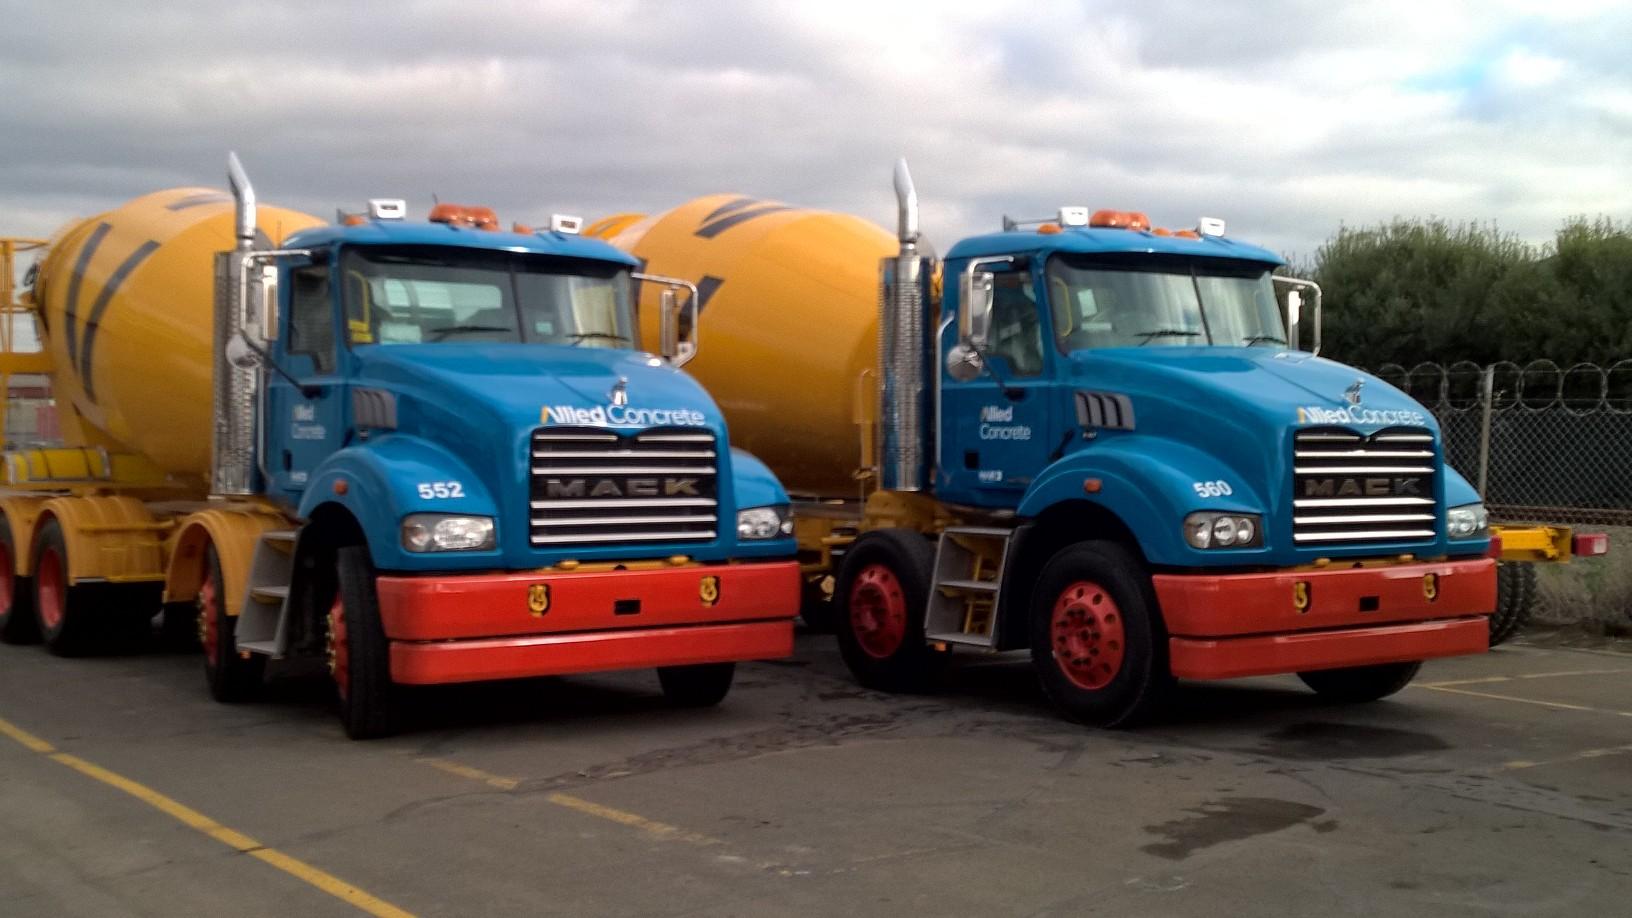 Allied concrete trucks1.jpg